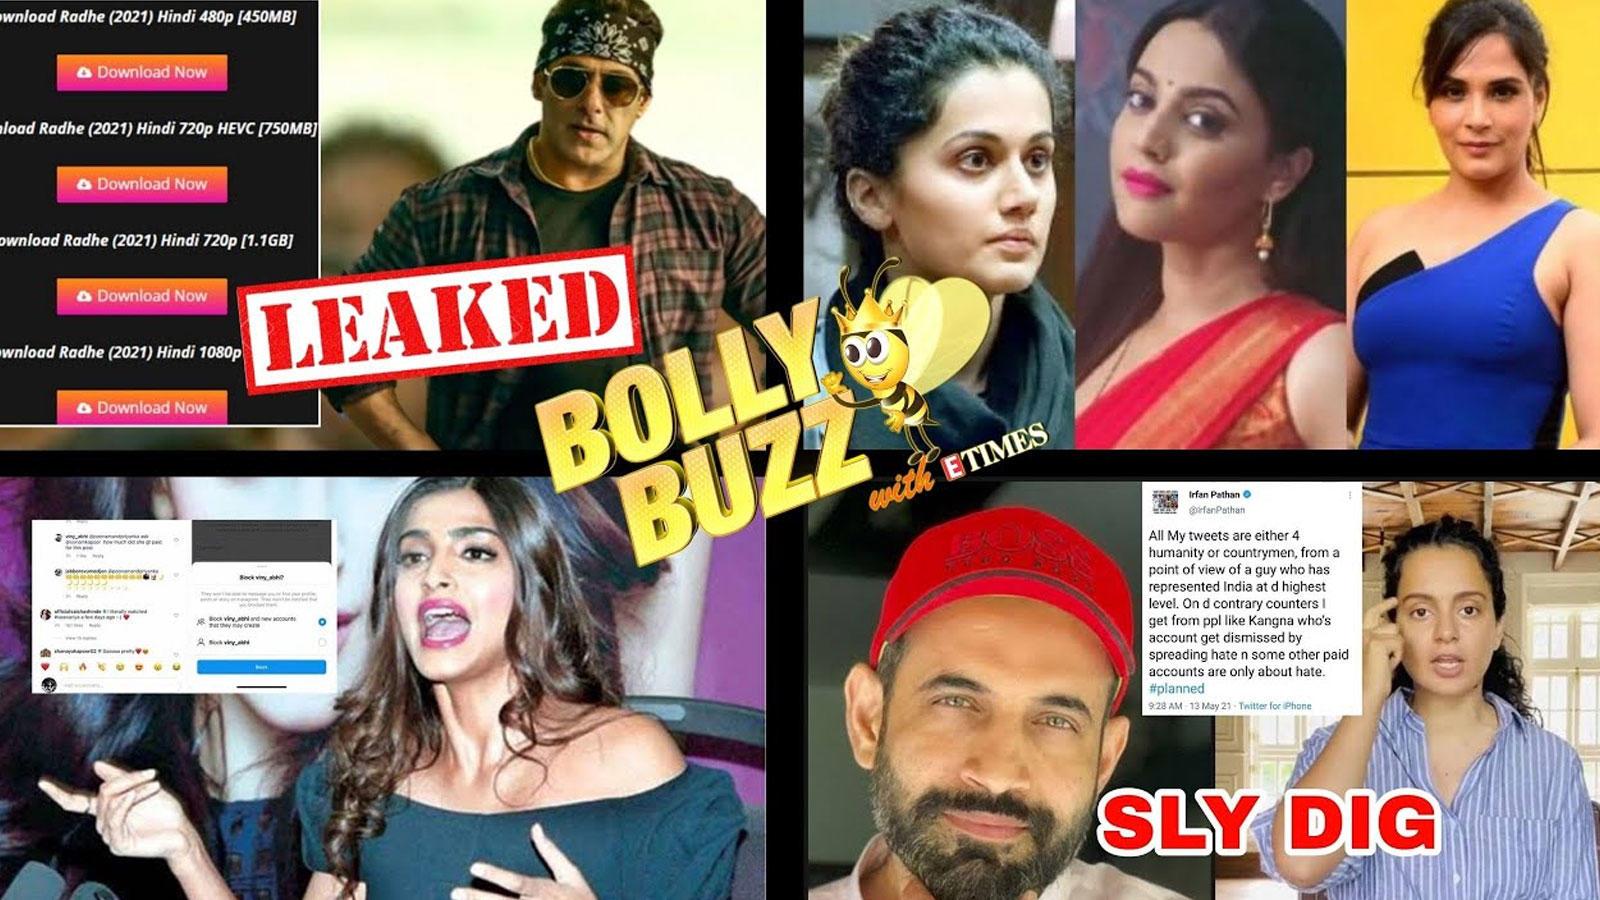 bolly-buzz-salman-khans-radhe-leaked-online-irfan-pathan-slams-kangana-ranaut